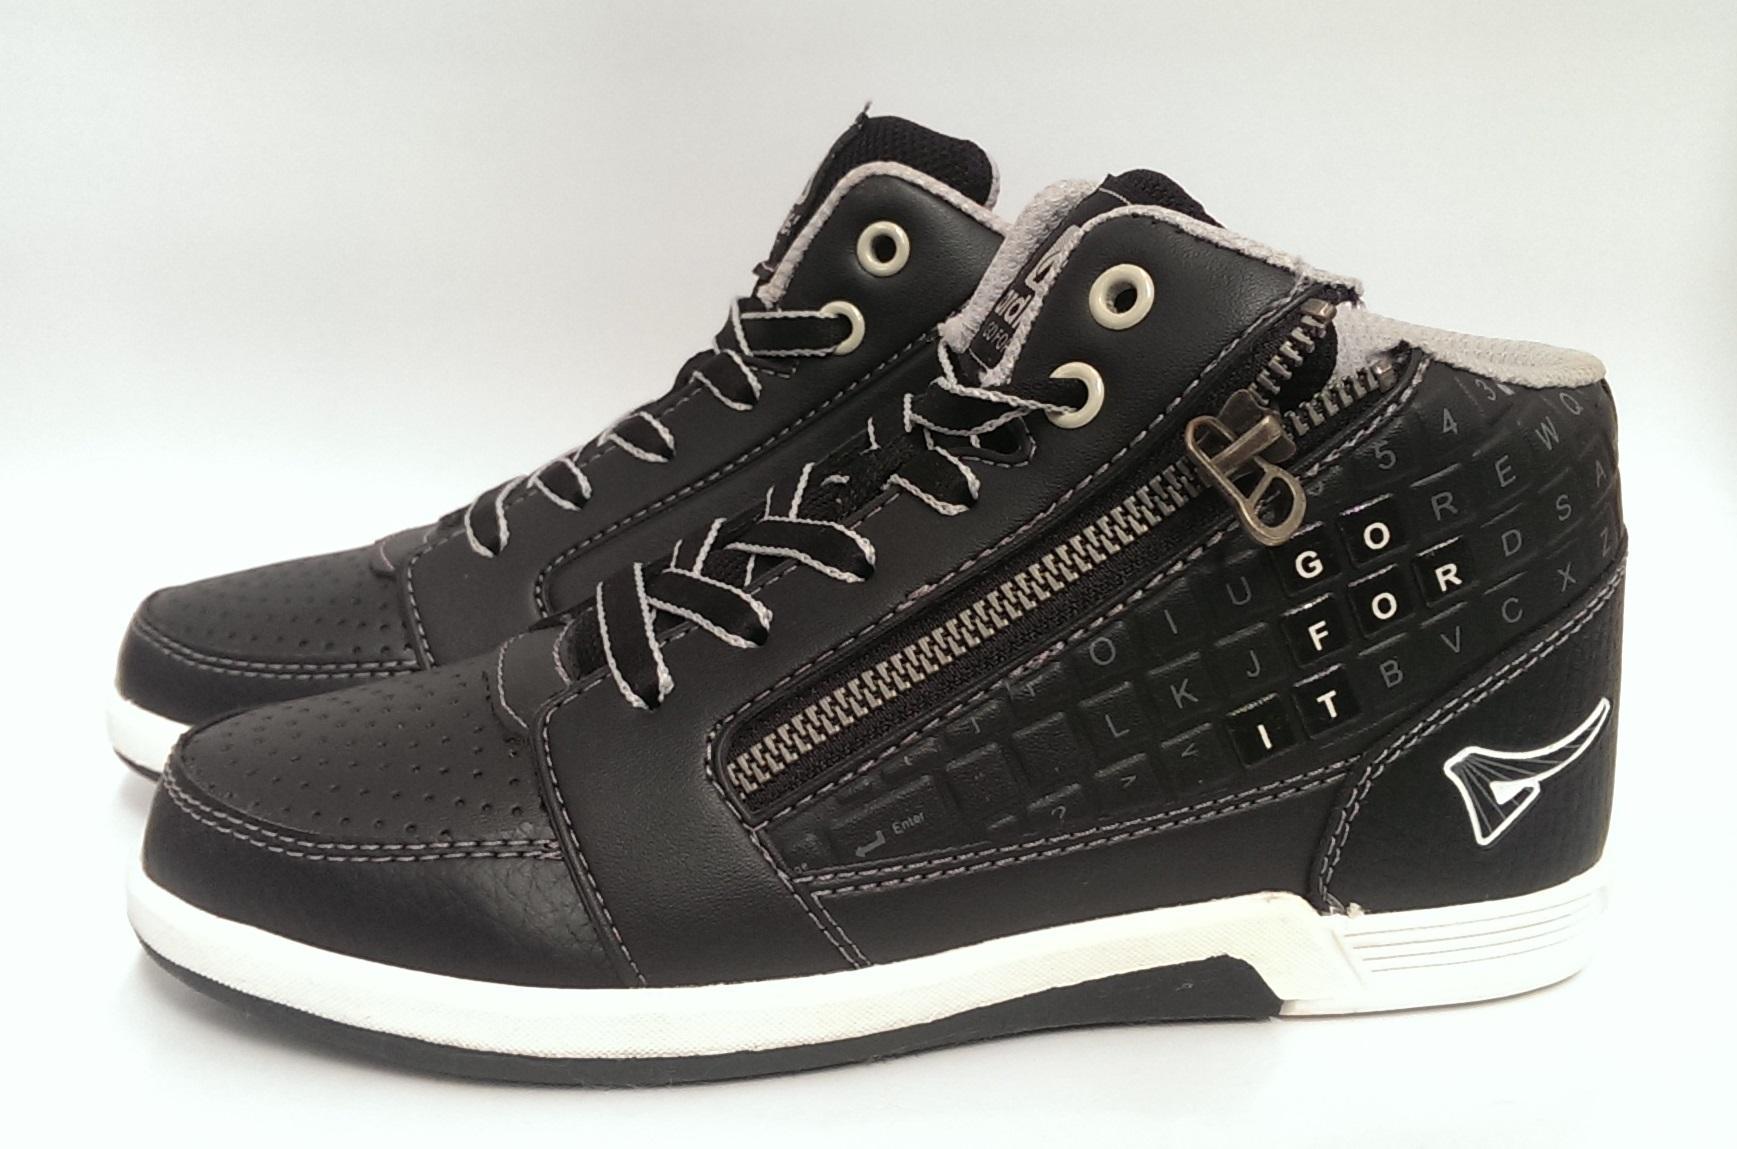 Jual Sepatu Ardiles Anak Laki Kets Spon Fashion Ket Cat Cats Wanita Sneaker Sneakers Sekolah Boots Ardiless Keyboard Hitam Putih